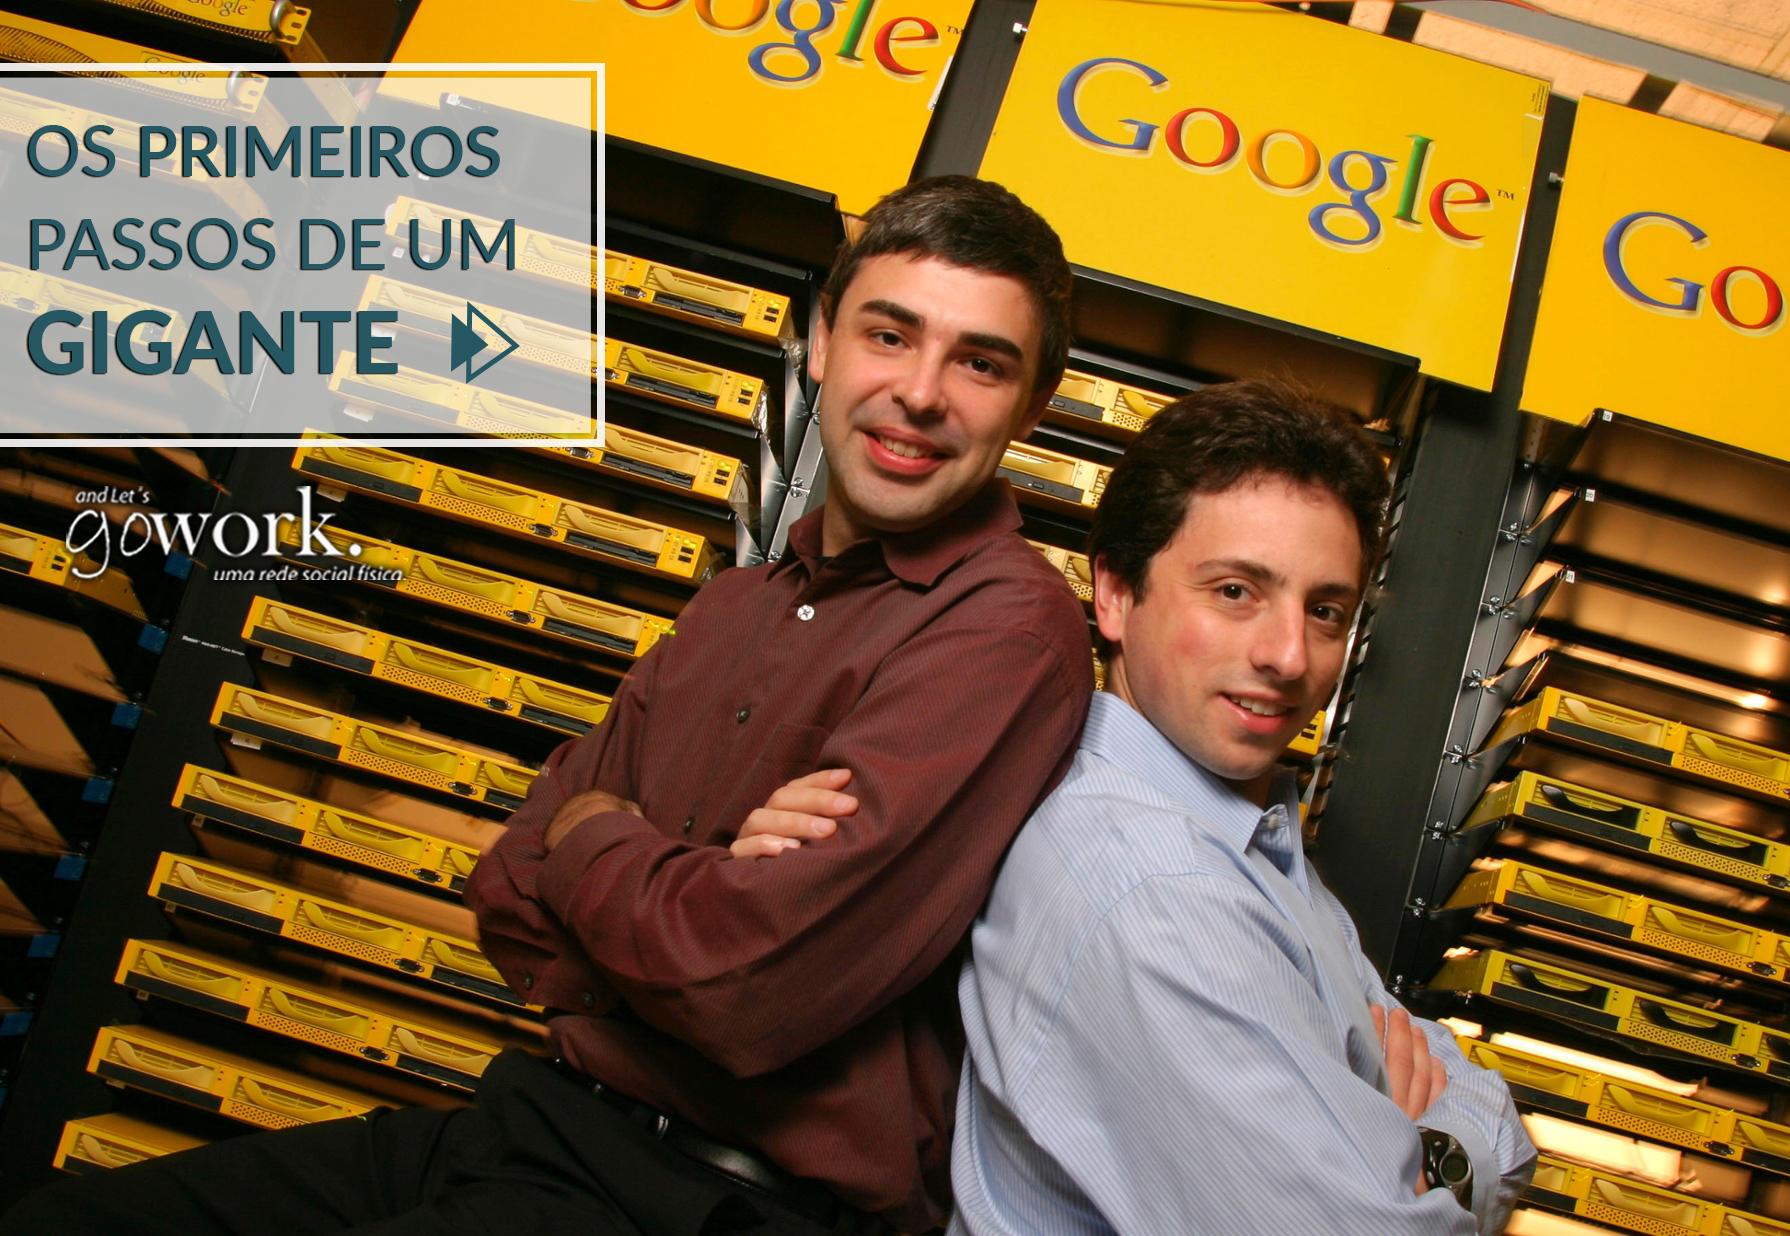 Coworking Google